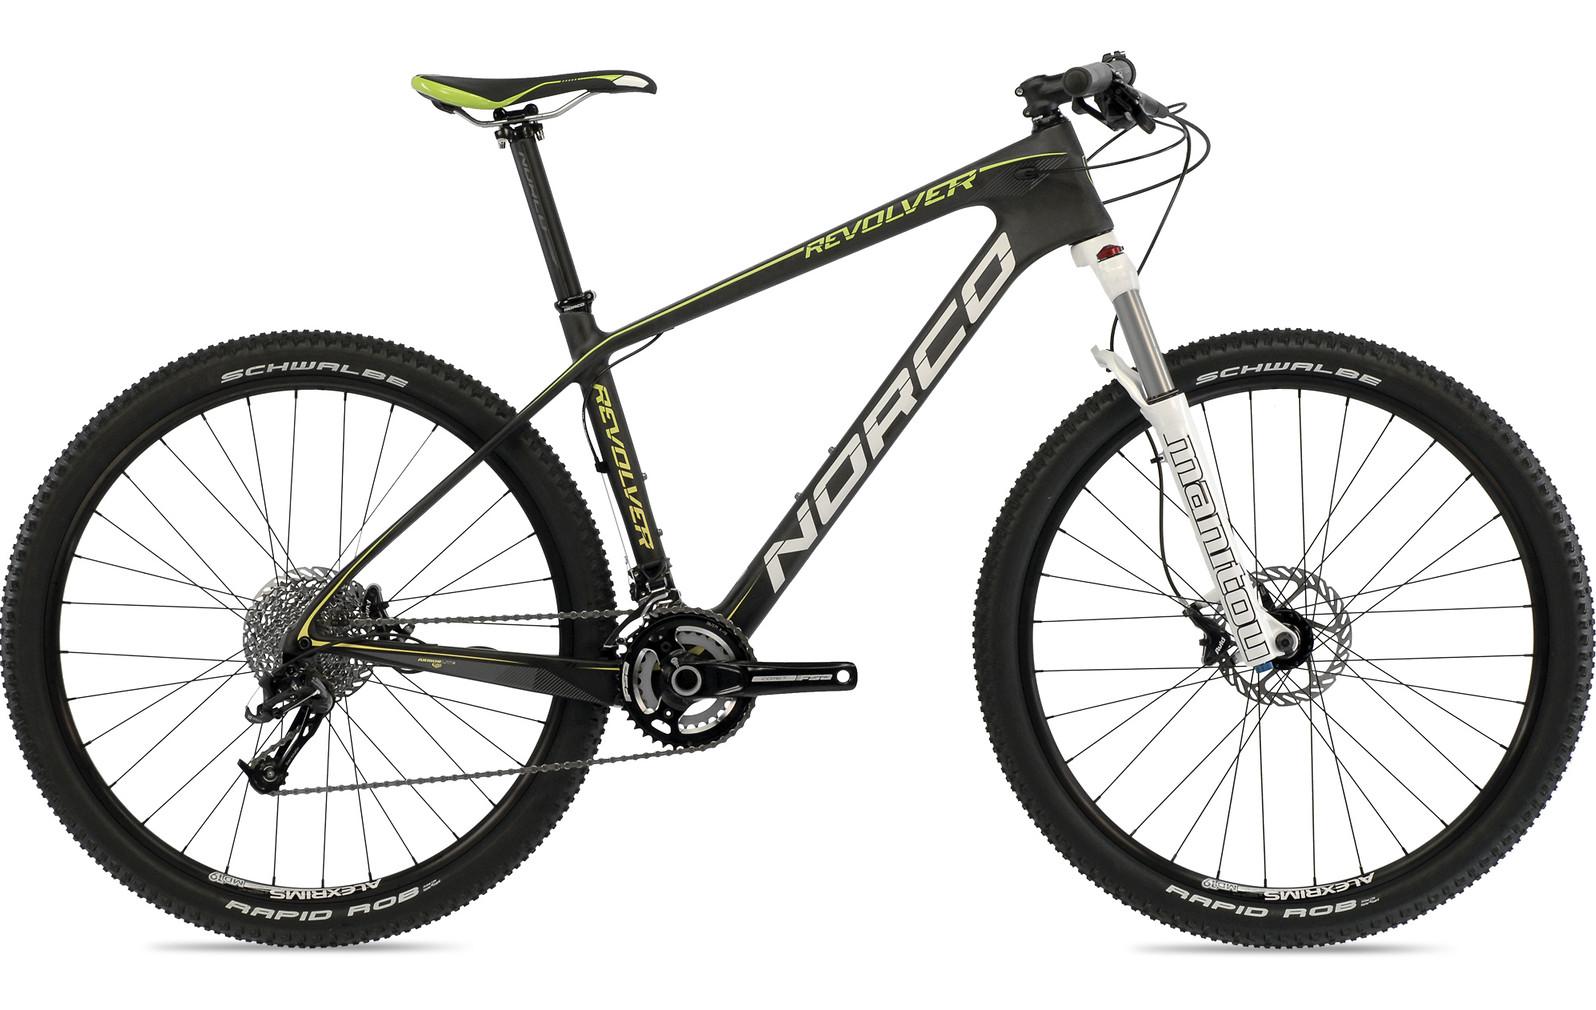 bike - 2014 Norco Revolver 7.2 HT